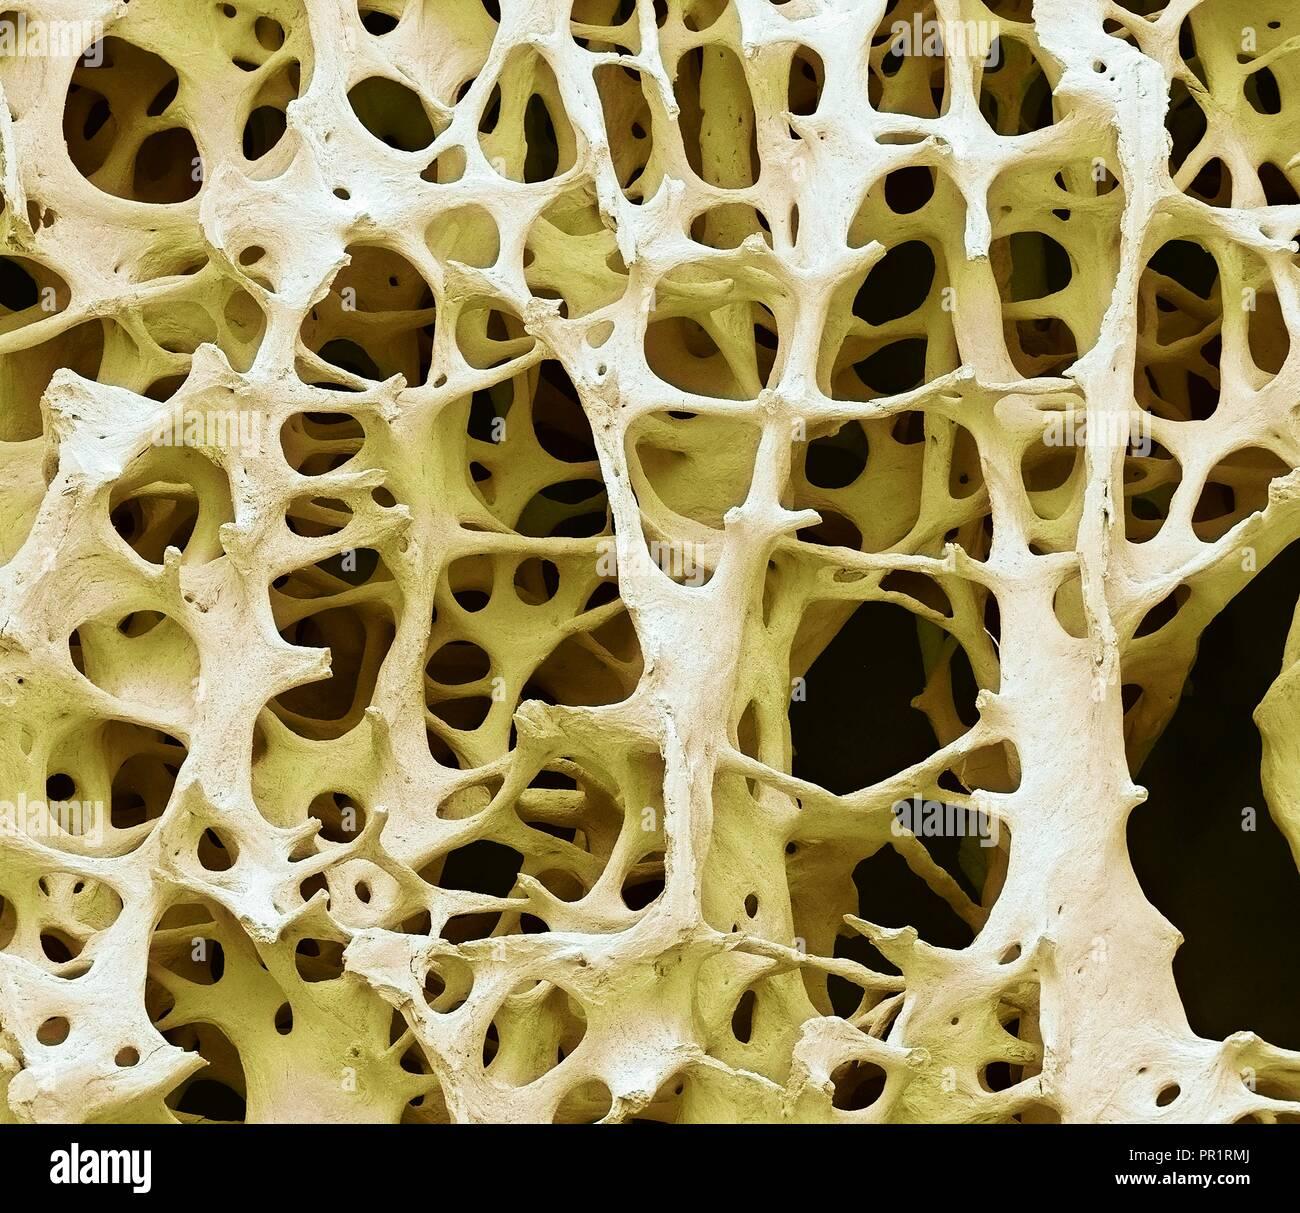 Spongy Bone Stock Photos & Spongy Bone Stock Images - Alamy